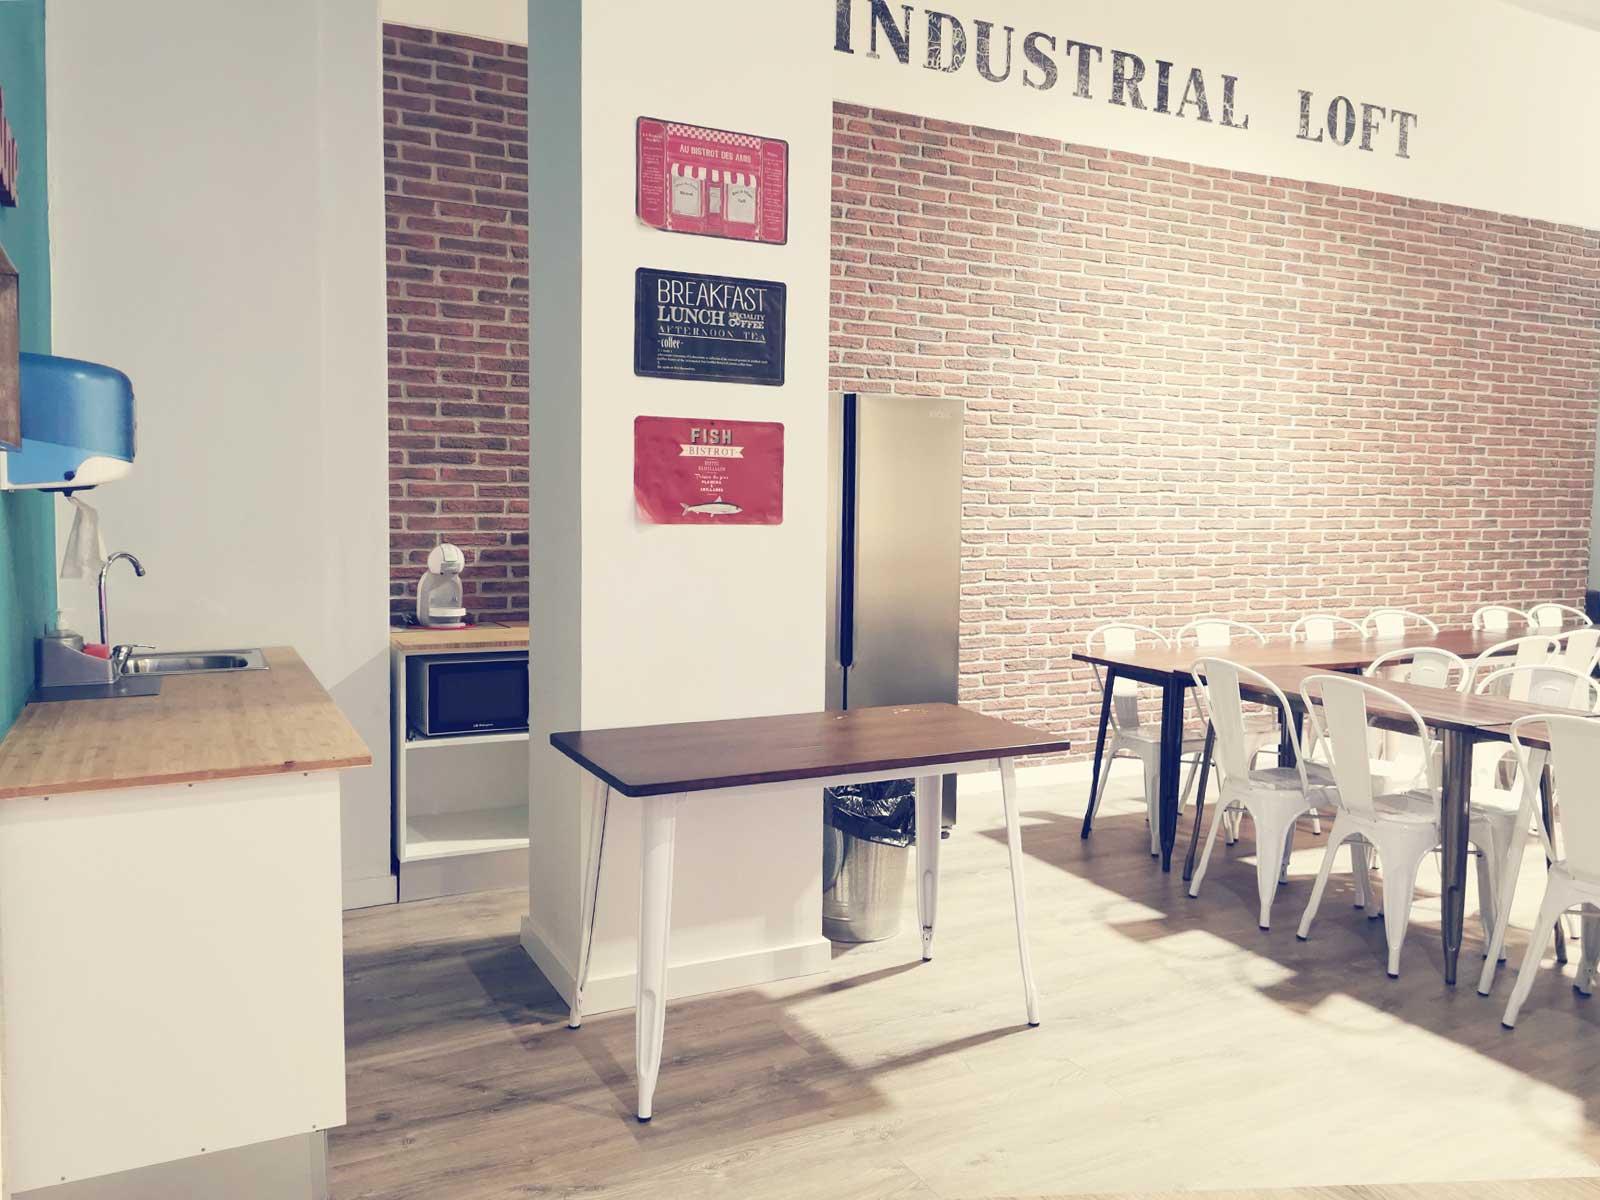 Industrial-Loft_Fiesta-Local_22